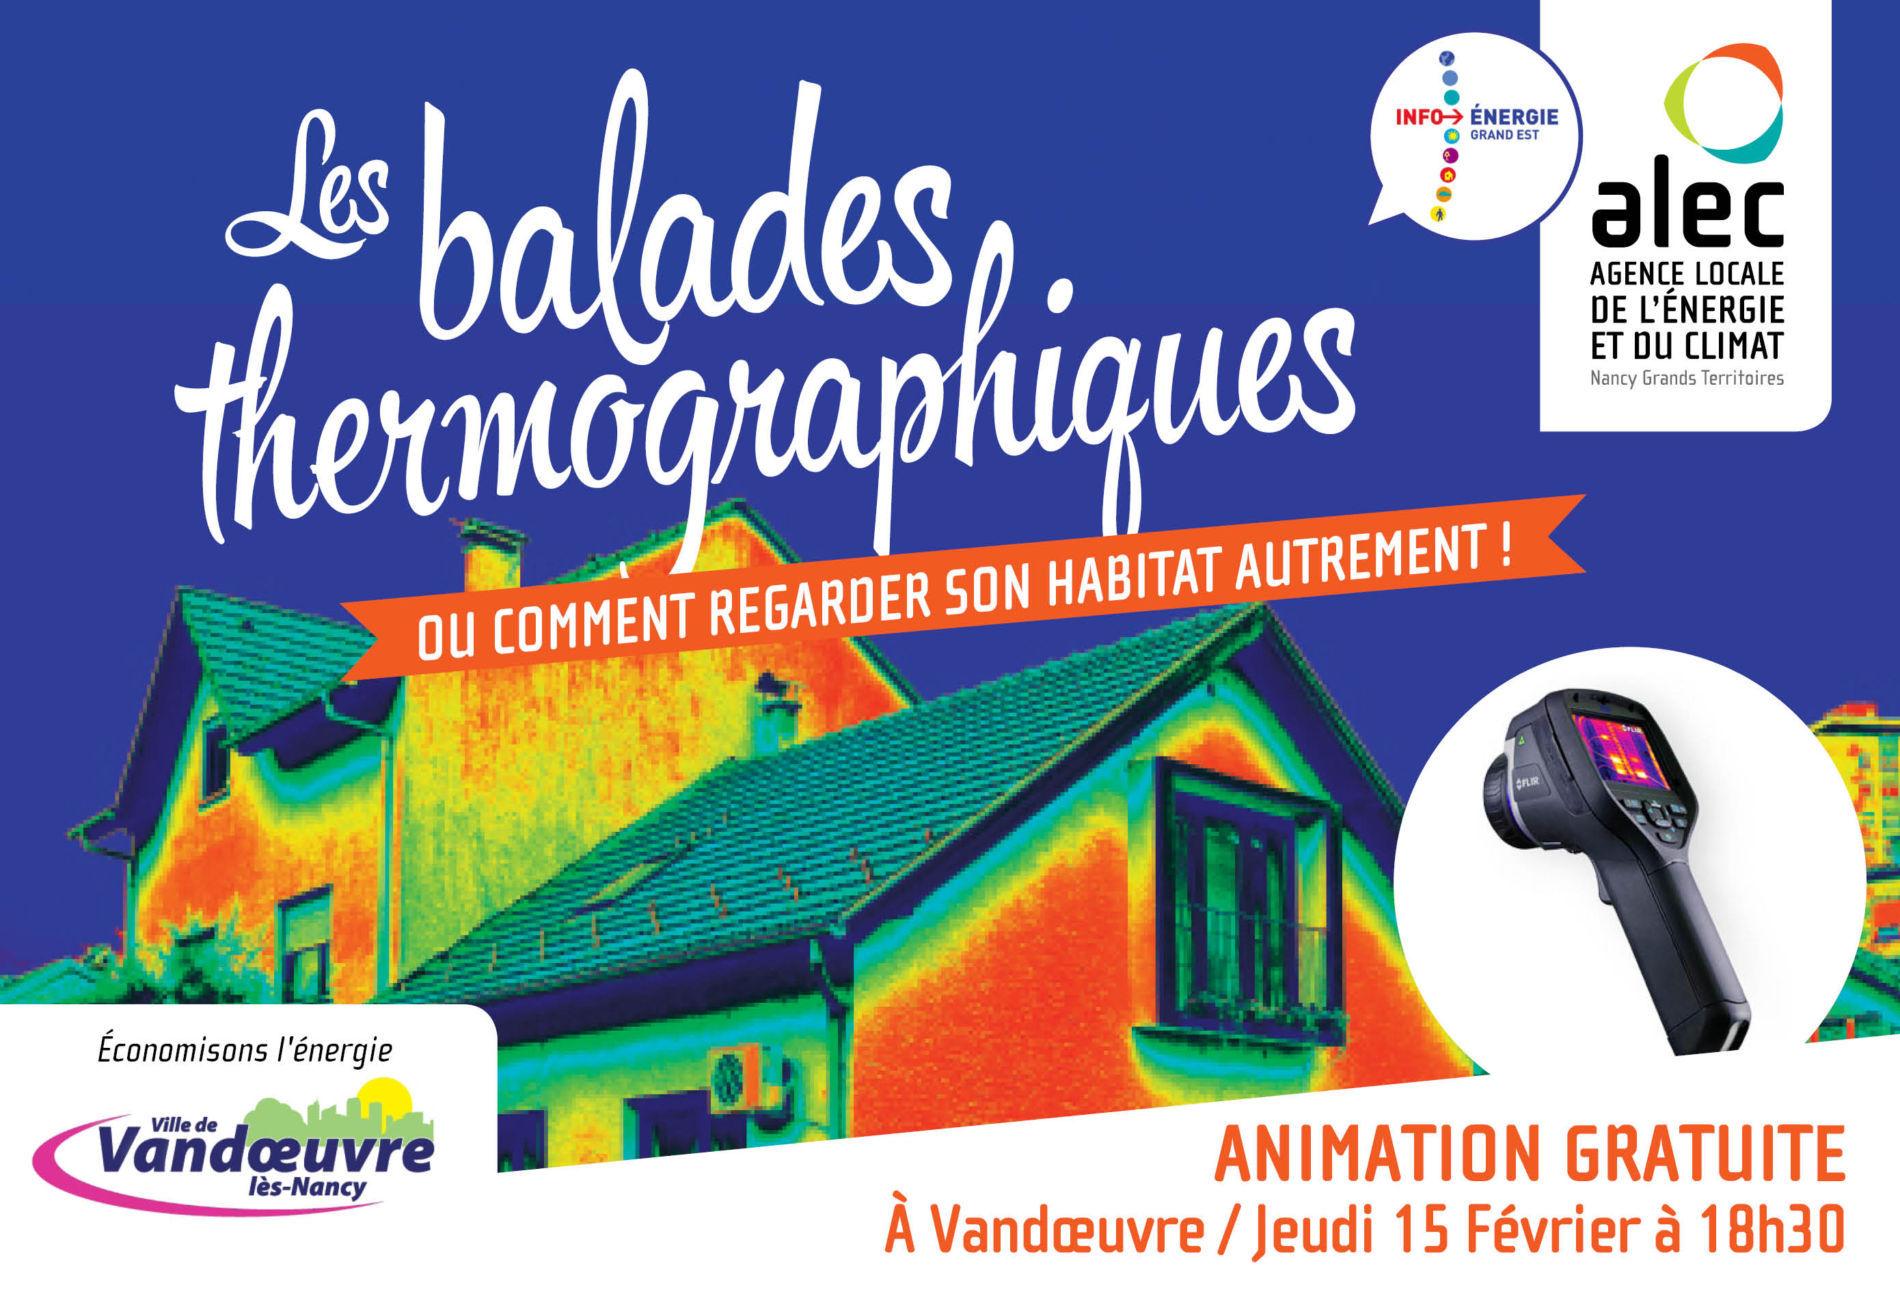 Balade thermographique Vandoeuvre-lès-Nancy